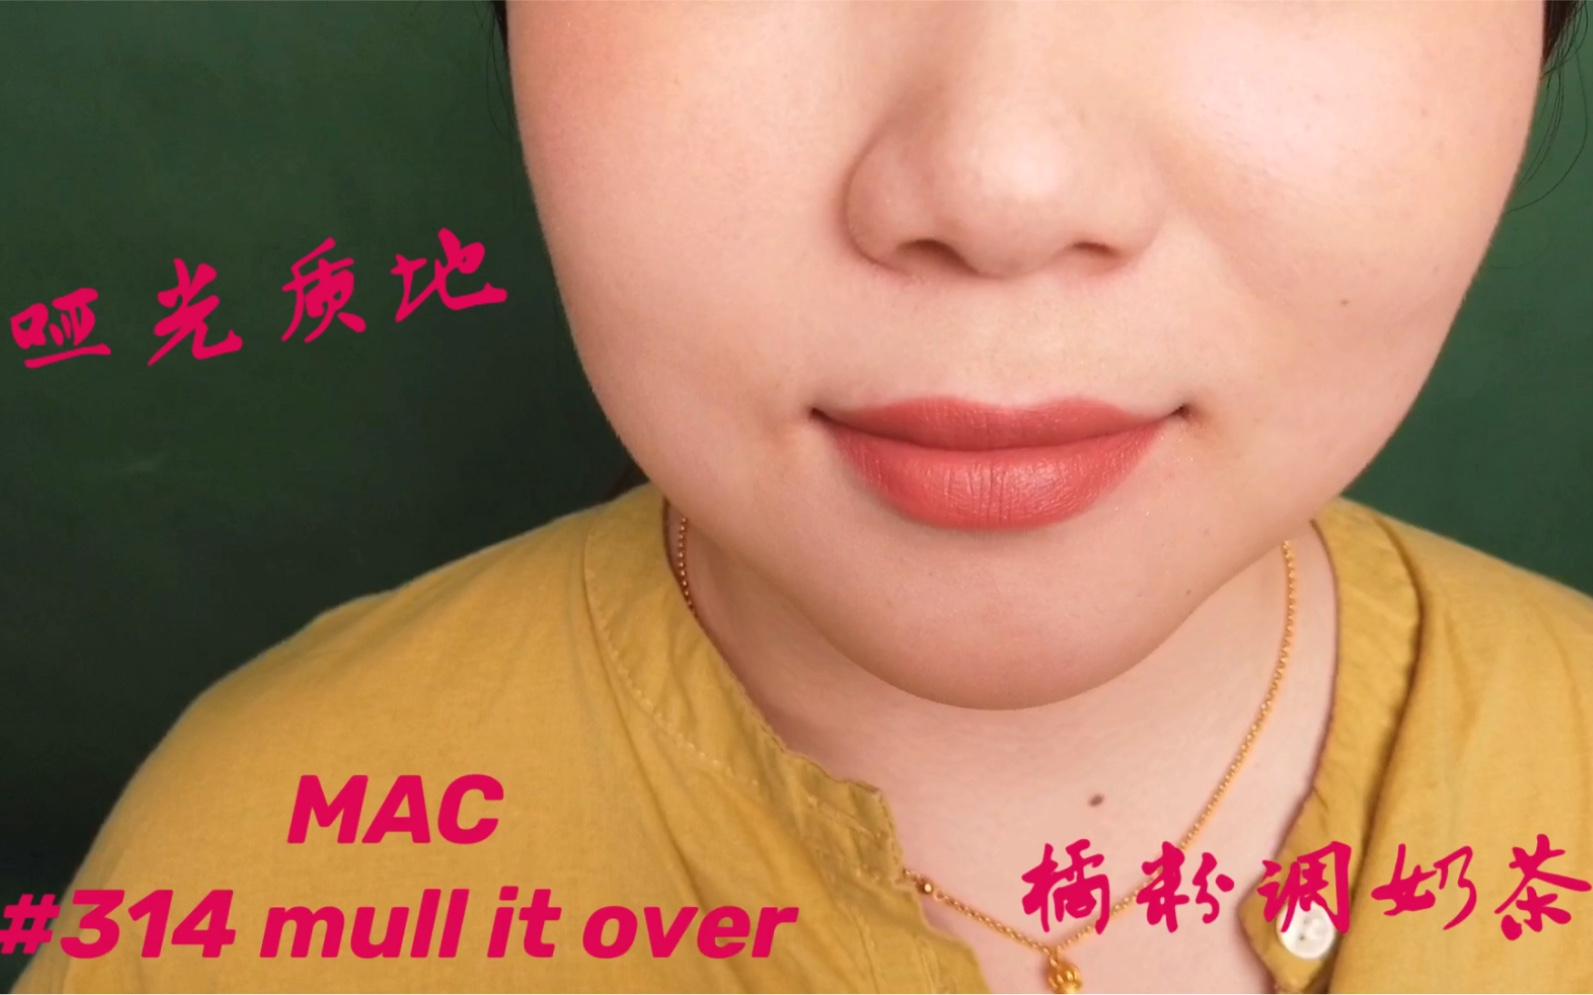 Mac mull it over